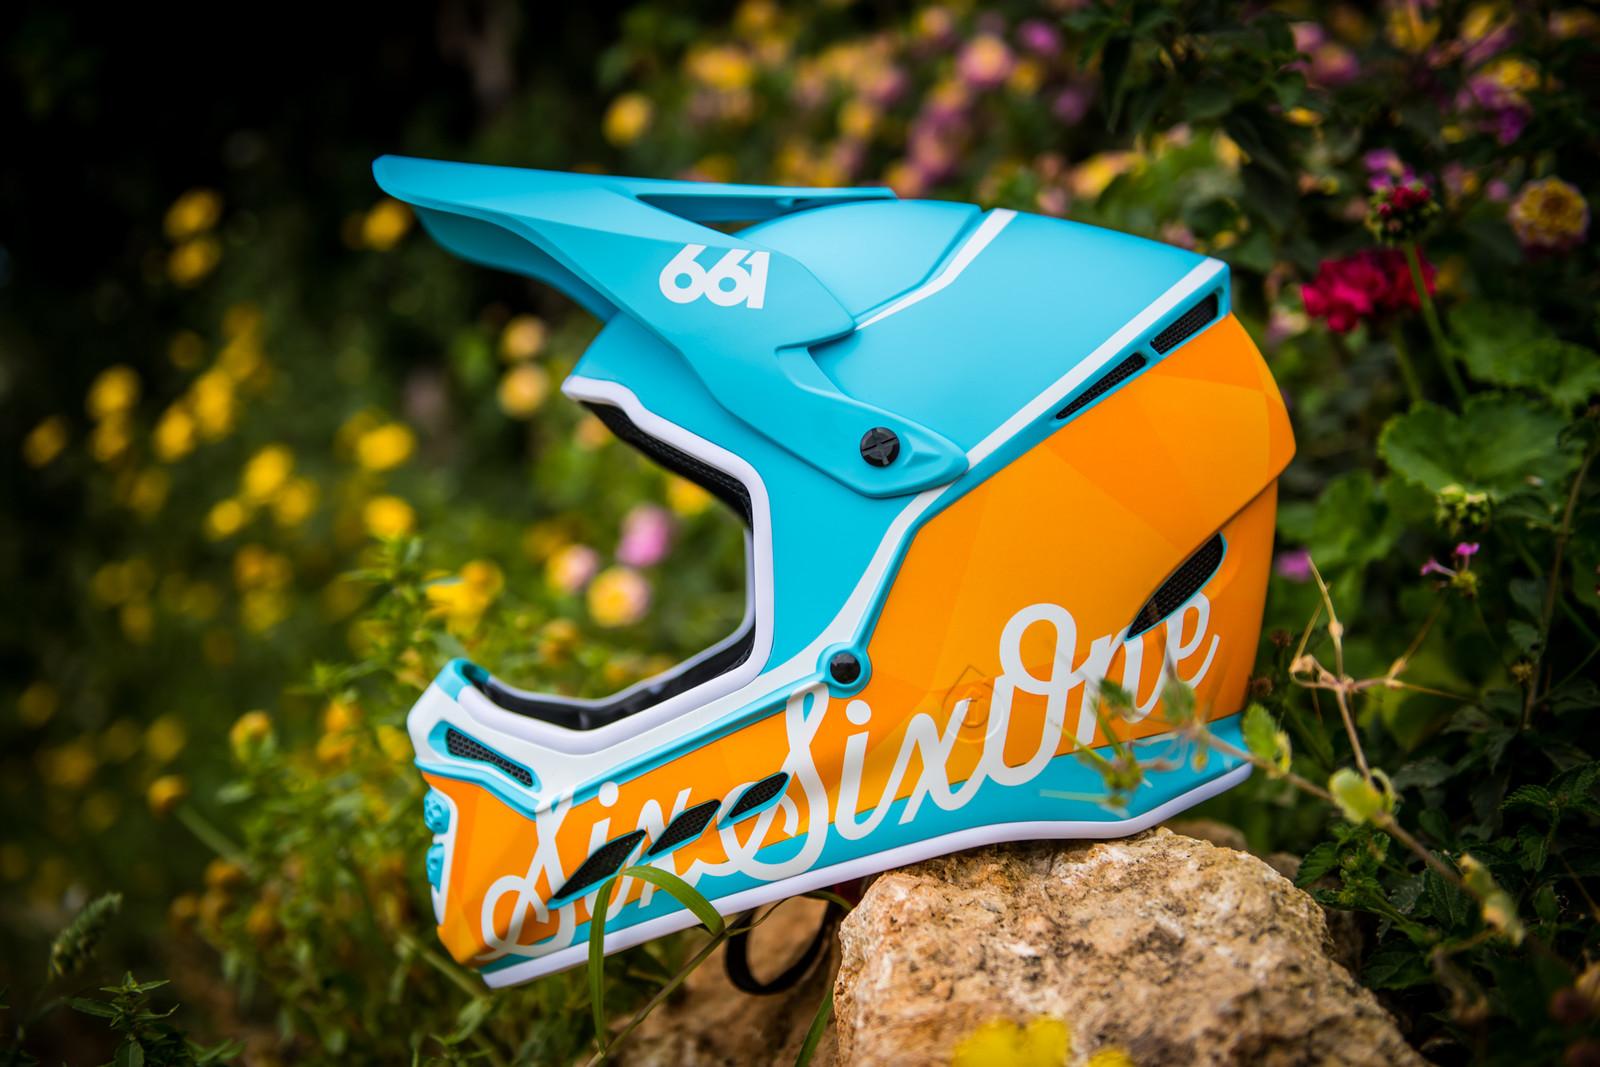 SixSixOne Reset MIPS Full Face Helmet - Reviews, Comparisons, Specs -  Mountain Bike Full Face Helmets - Vital MTB